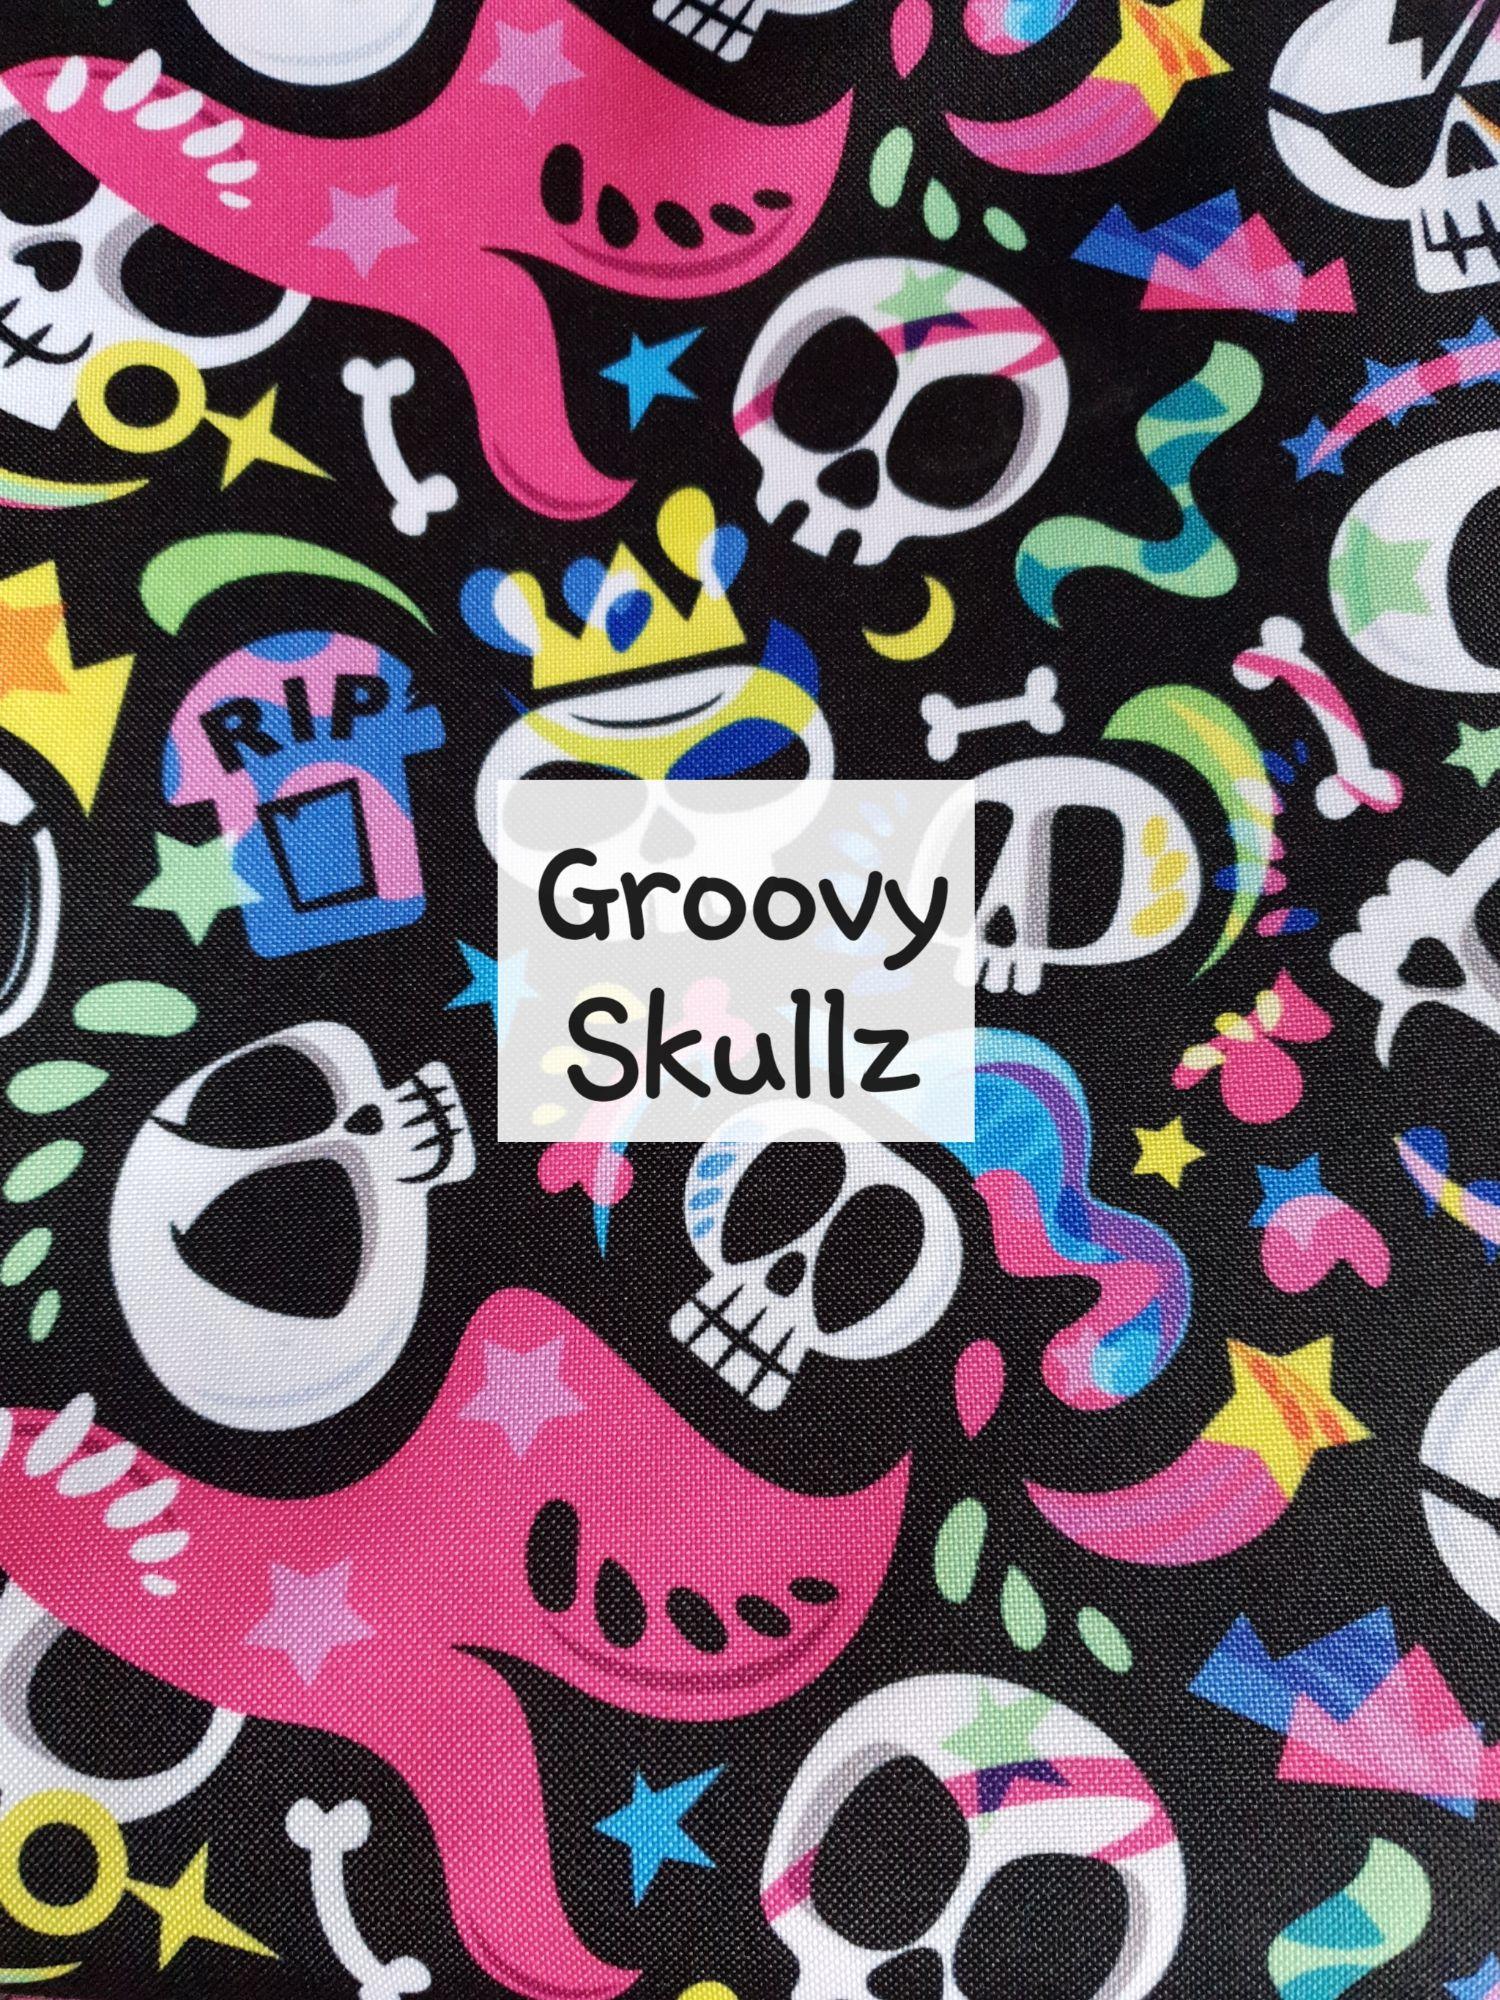 Groovy skullz waterproof fabric